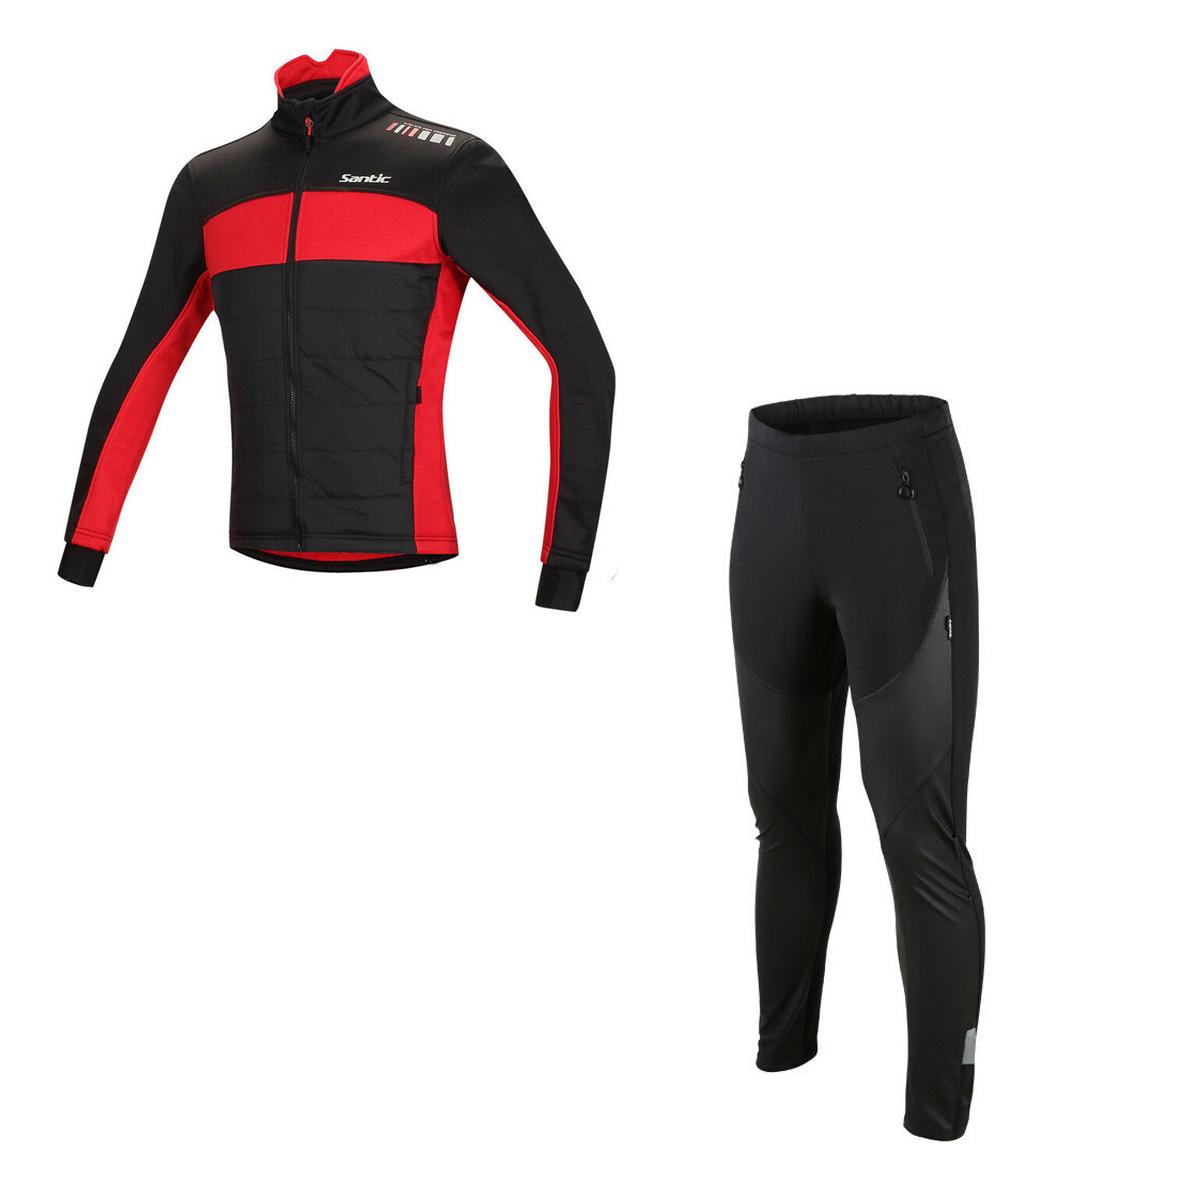 riding jerseys and pants